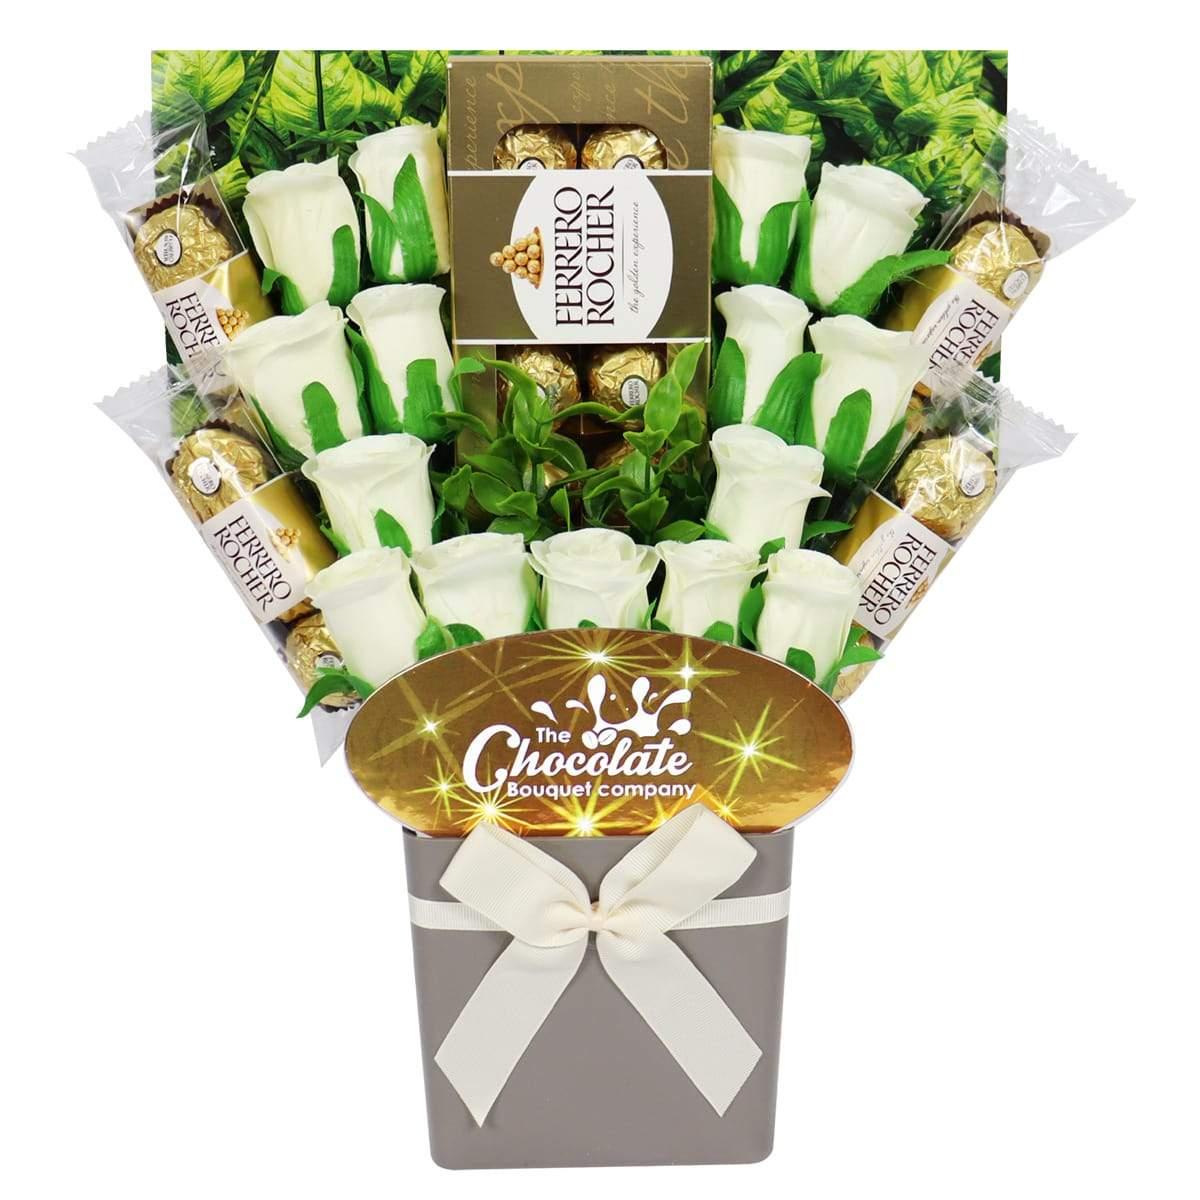 The Ferrero Rocher Chocolate Bouquet